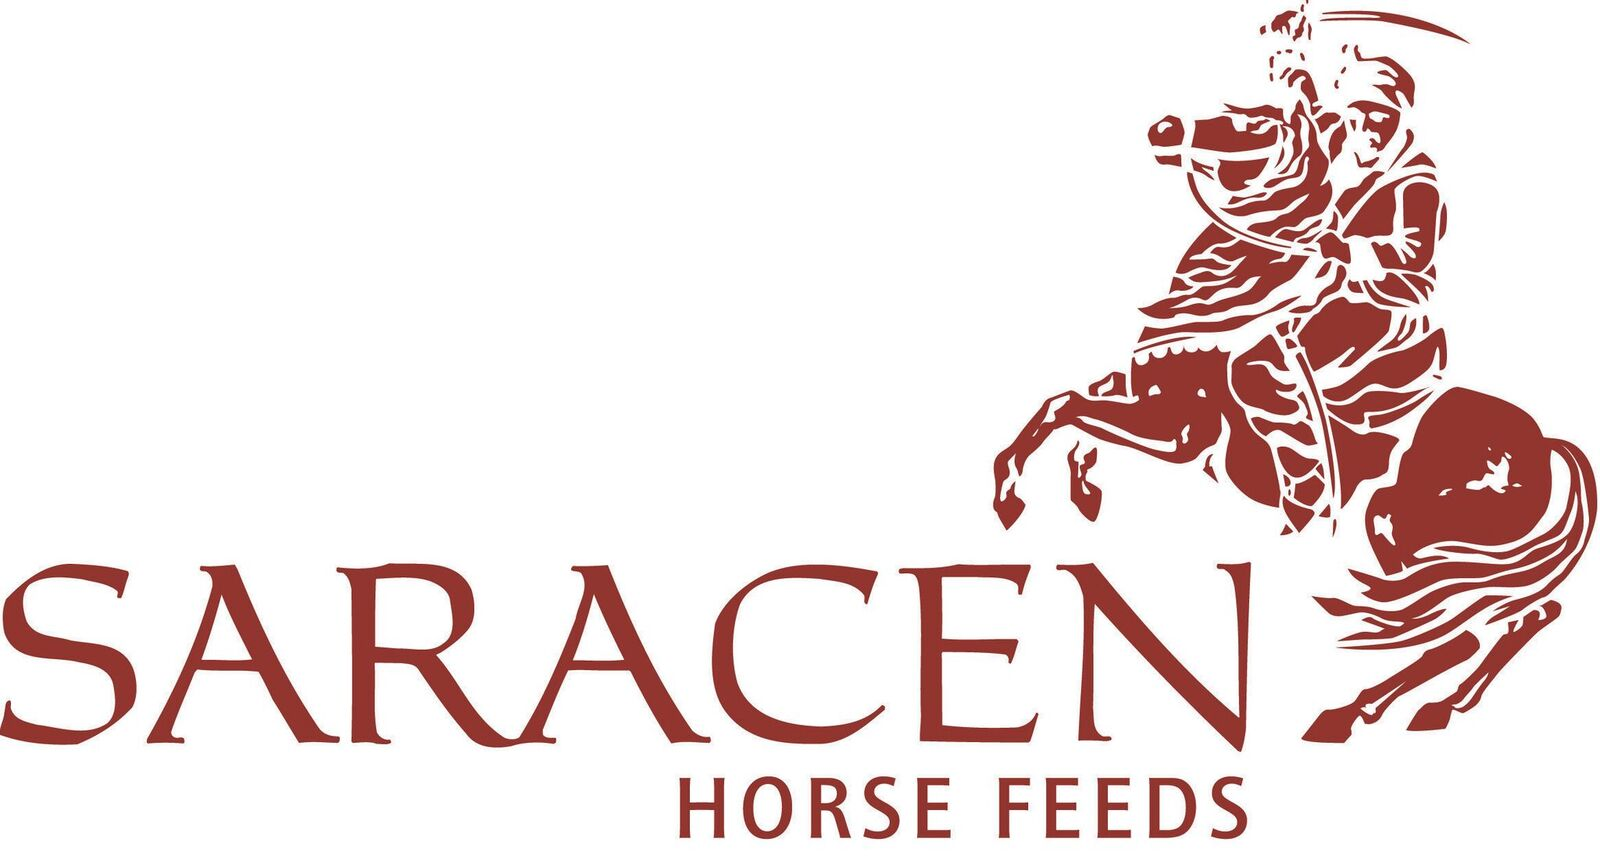 SARACEN Horse Feeds, ENGLAND - krmivo olympijských vítězů